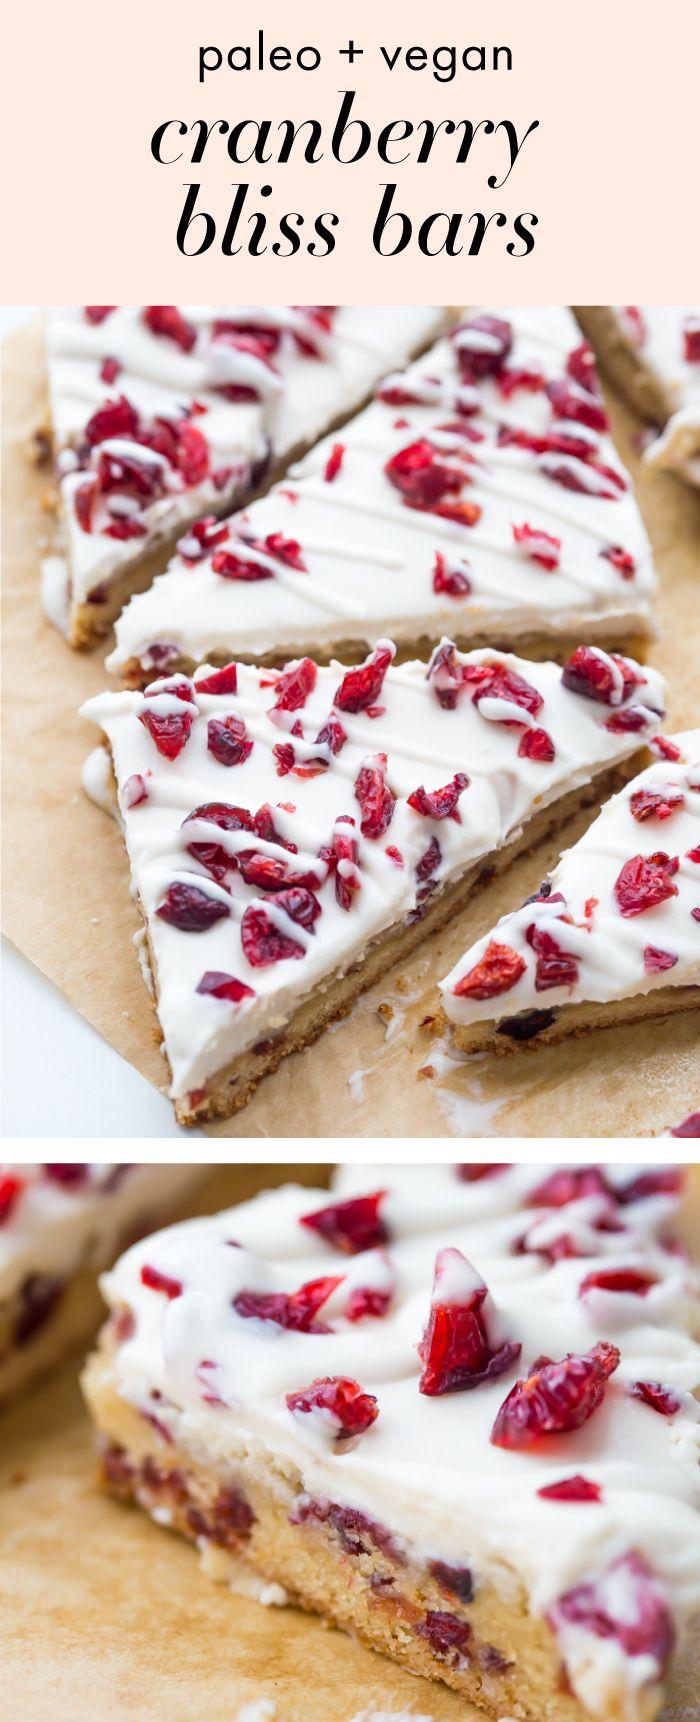 Paleo Cranberry Bliss Bars (Vegan Cranberry Bliss Bars)